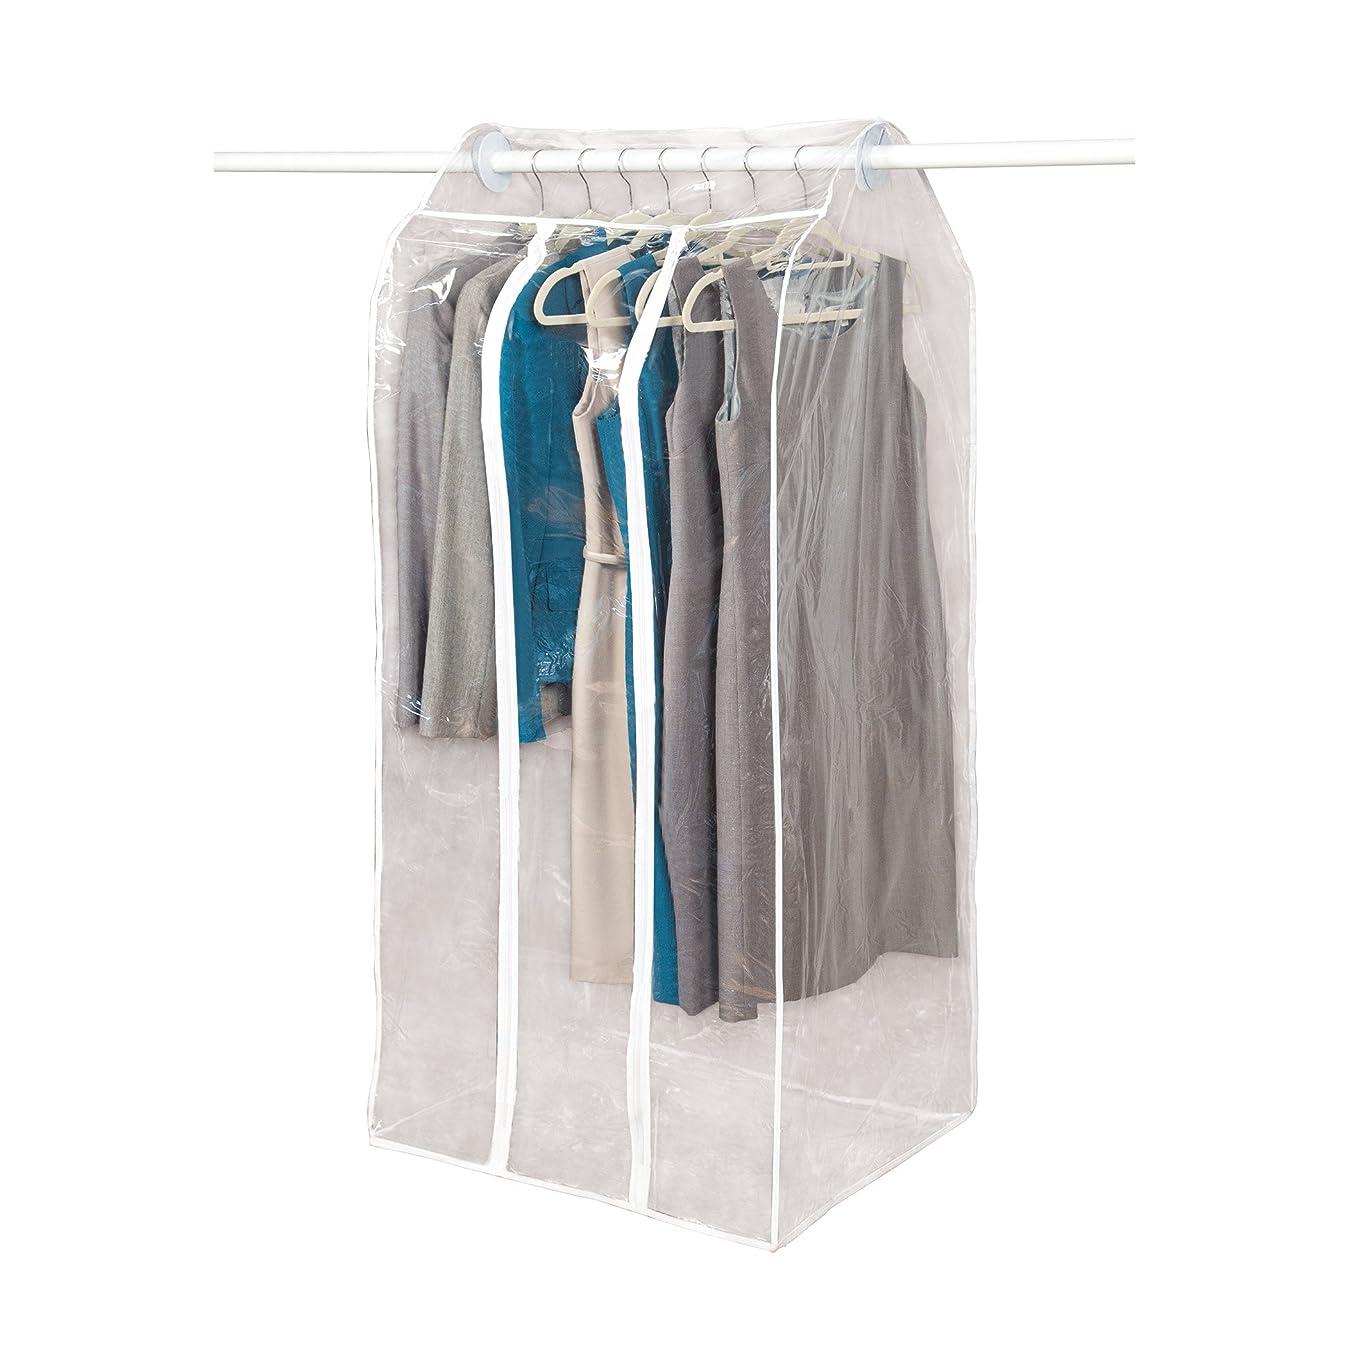 Jumbo Frameless Garment Bag Organize Storage Clean Neat (24